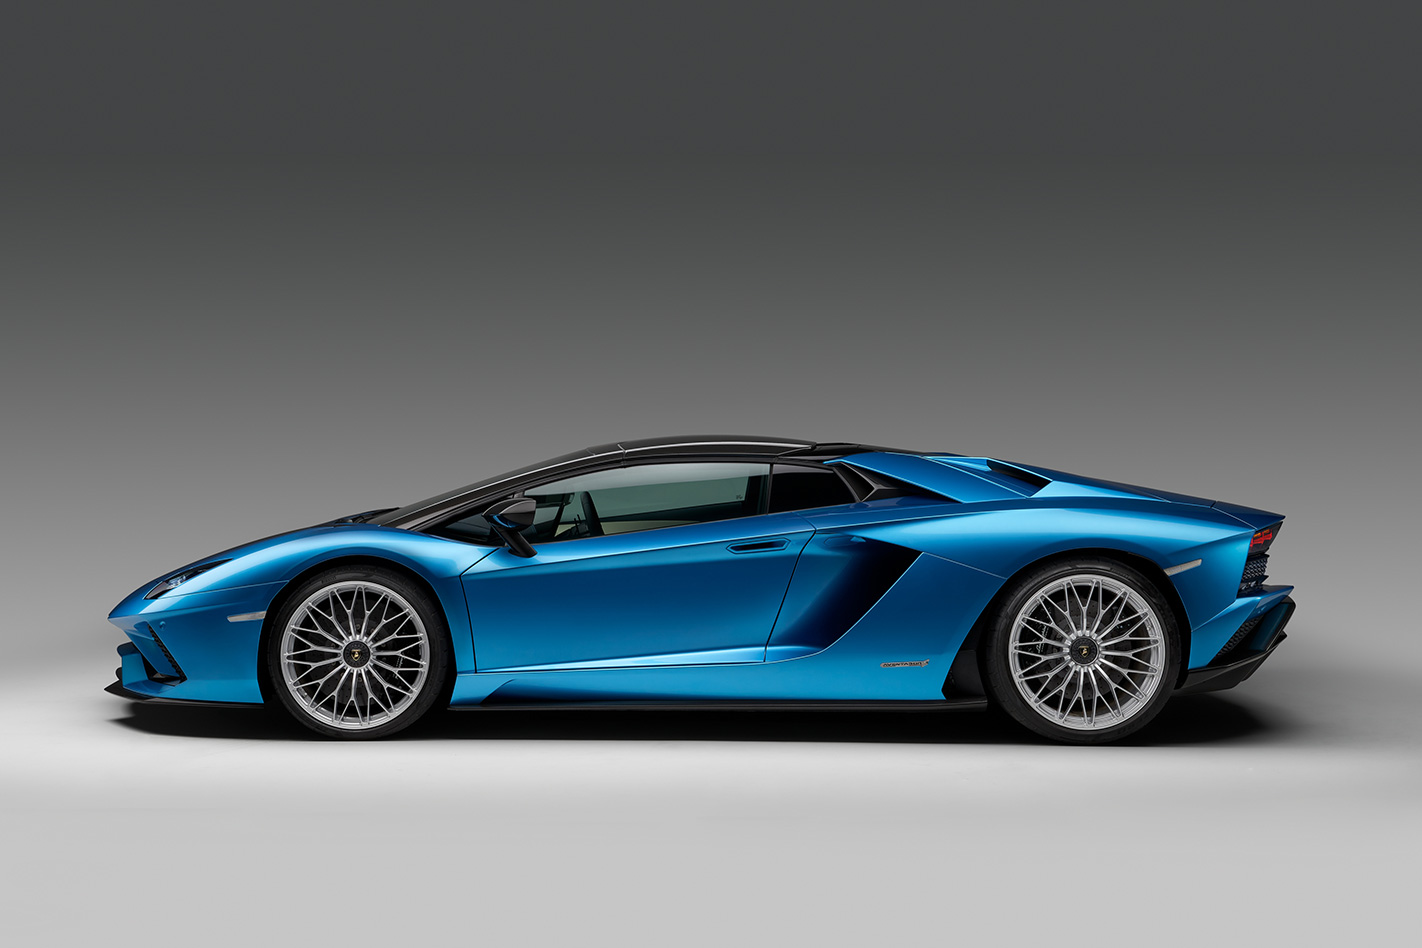 Lamborghini Aventador S Roadster side